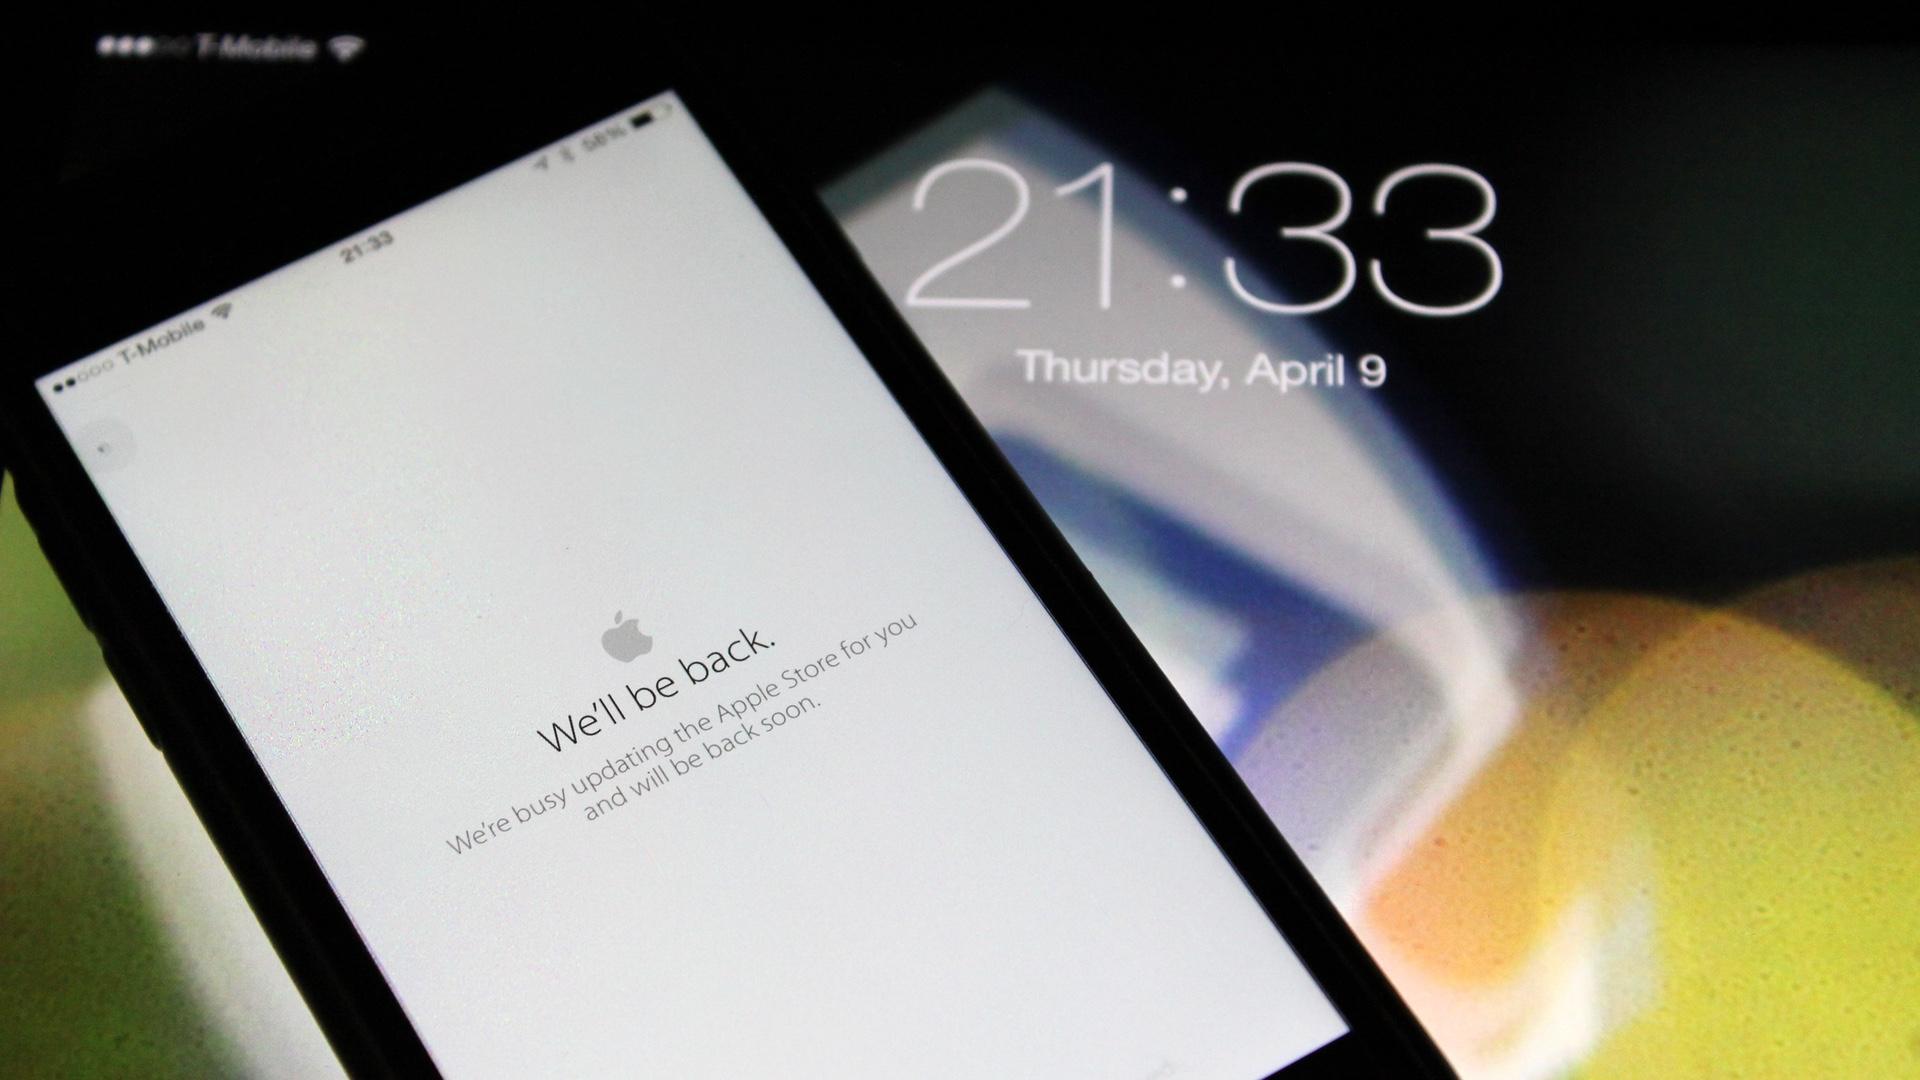 Apple Store Offline Apple Watch Pre-Order